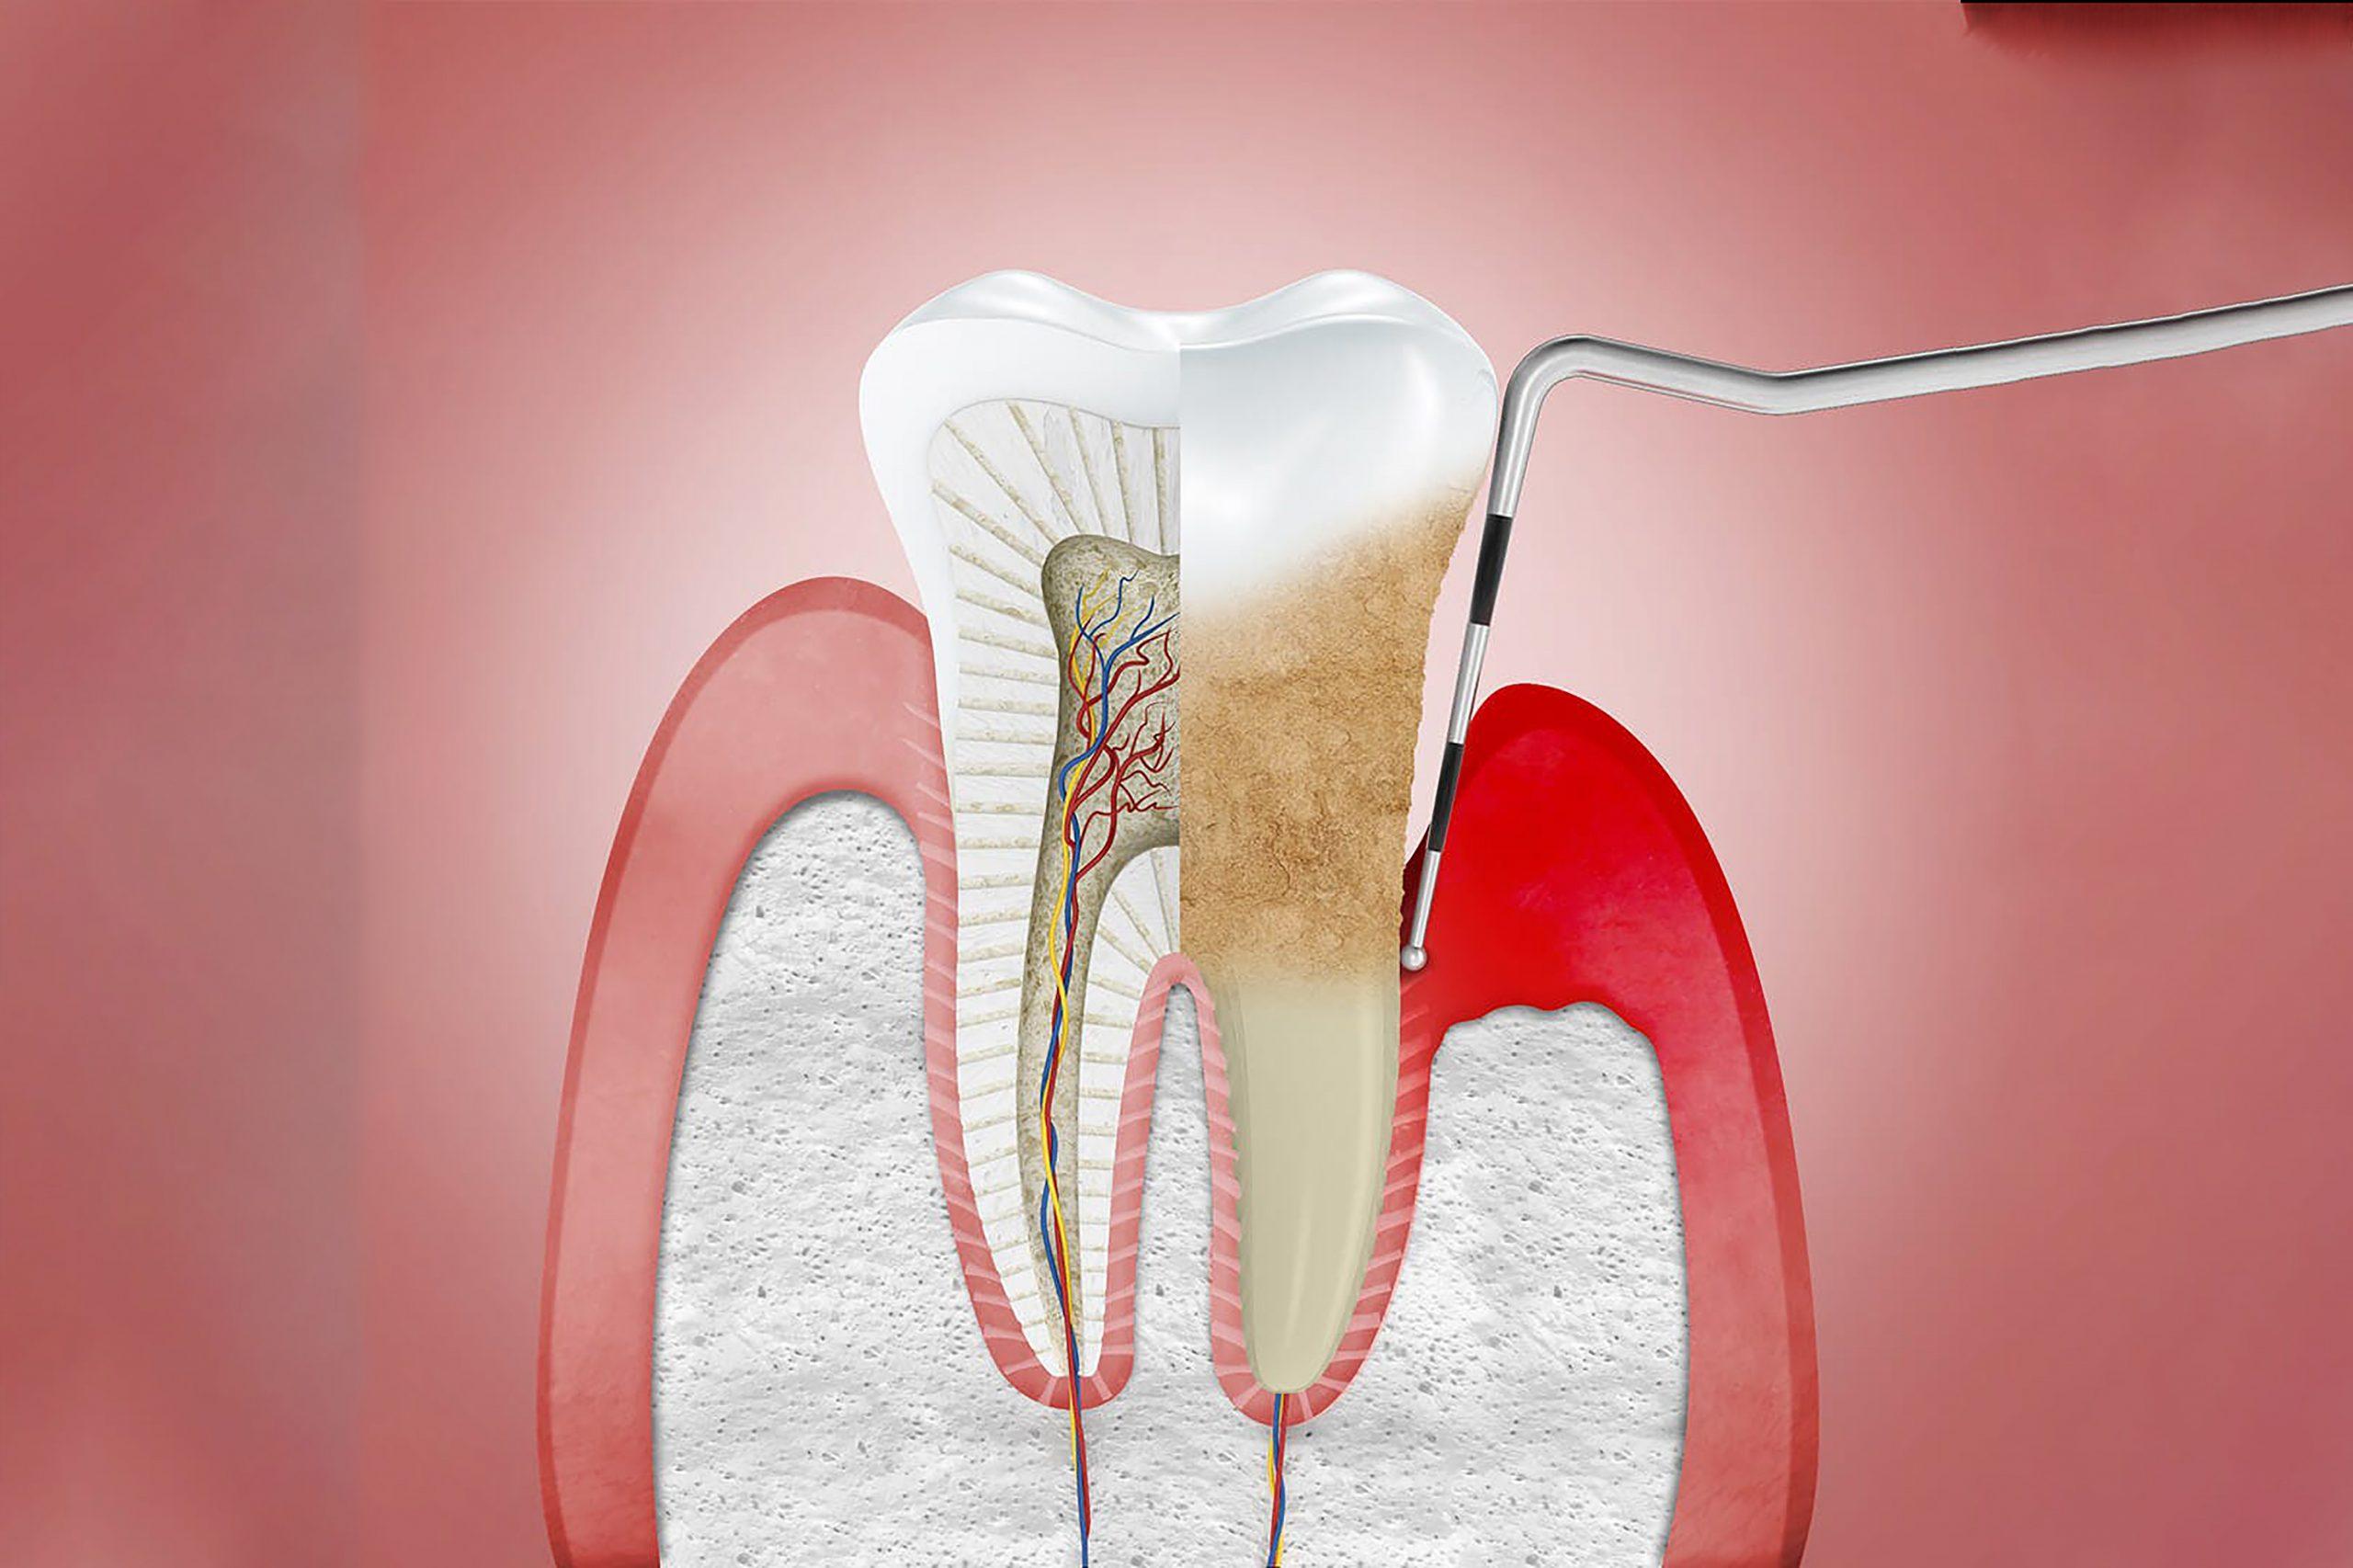 Periodontitis Treatment at Stillwater Dental